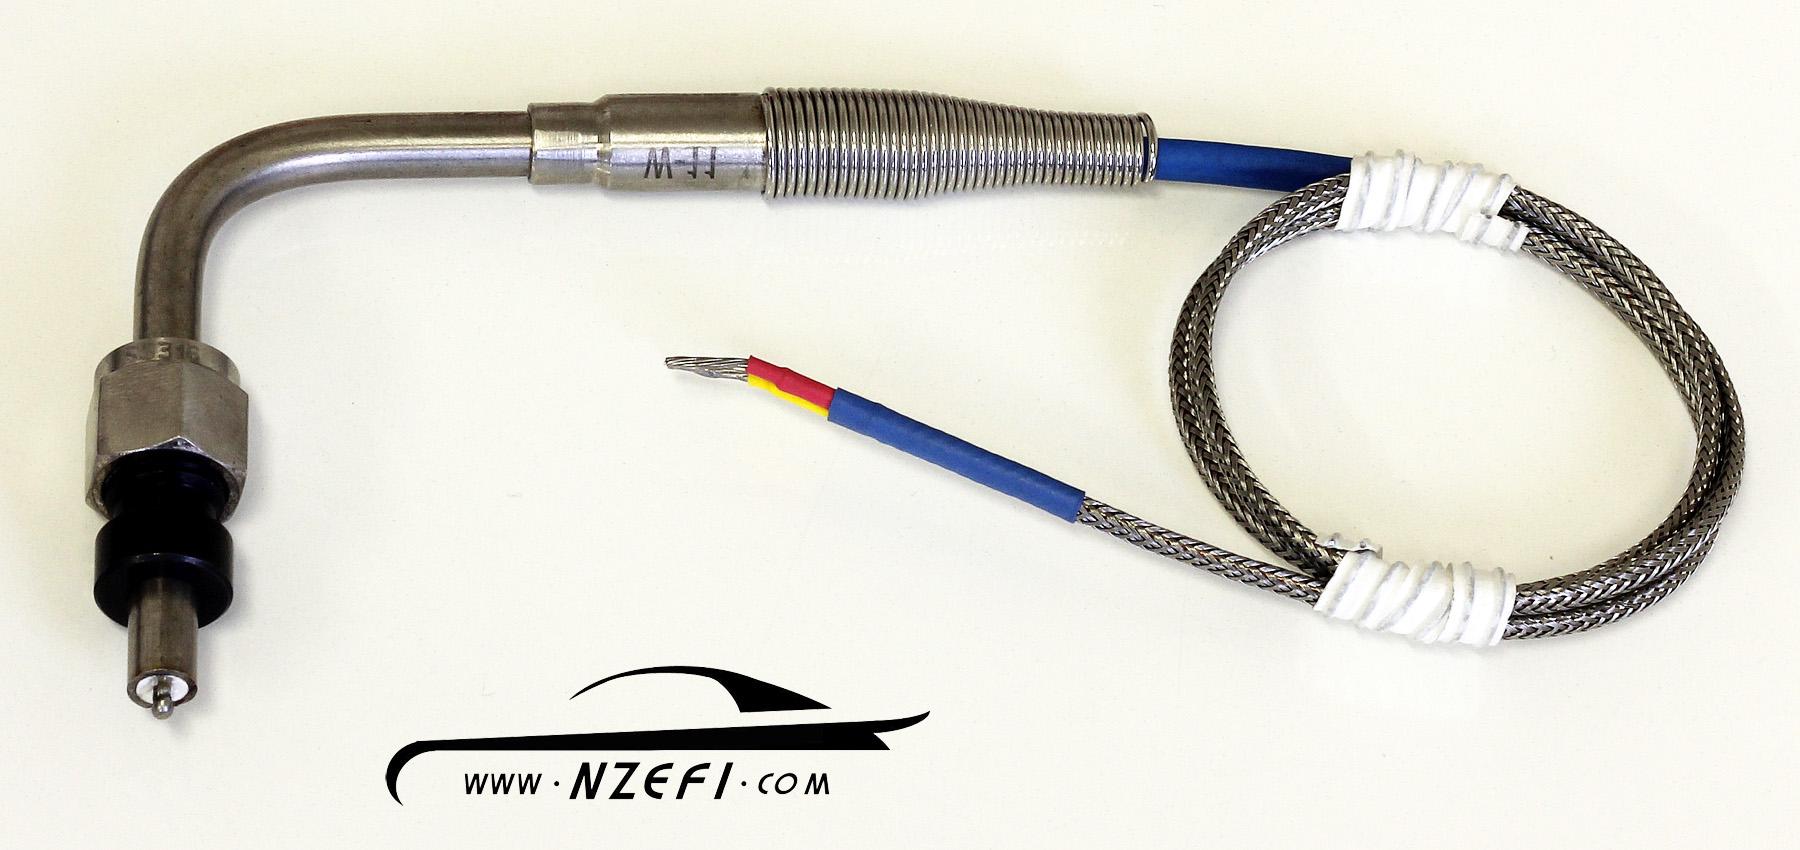 Honeywell 150 Psi Oil Pressure Sensor Nzefi Performance Tuning R33 Ecu Wiring Diagram Egt Exhaust Gas Temperature Thermocouple